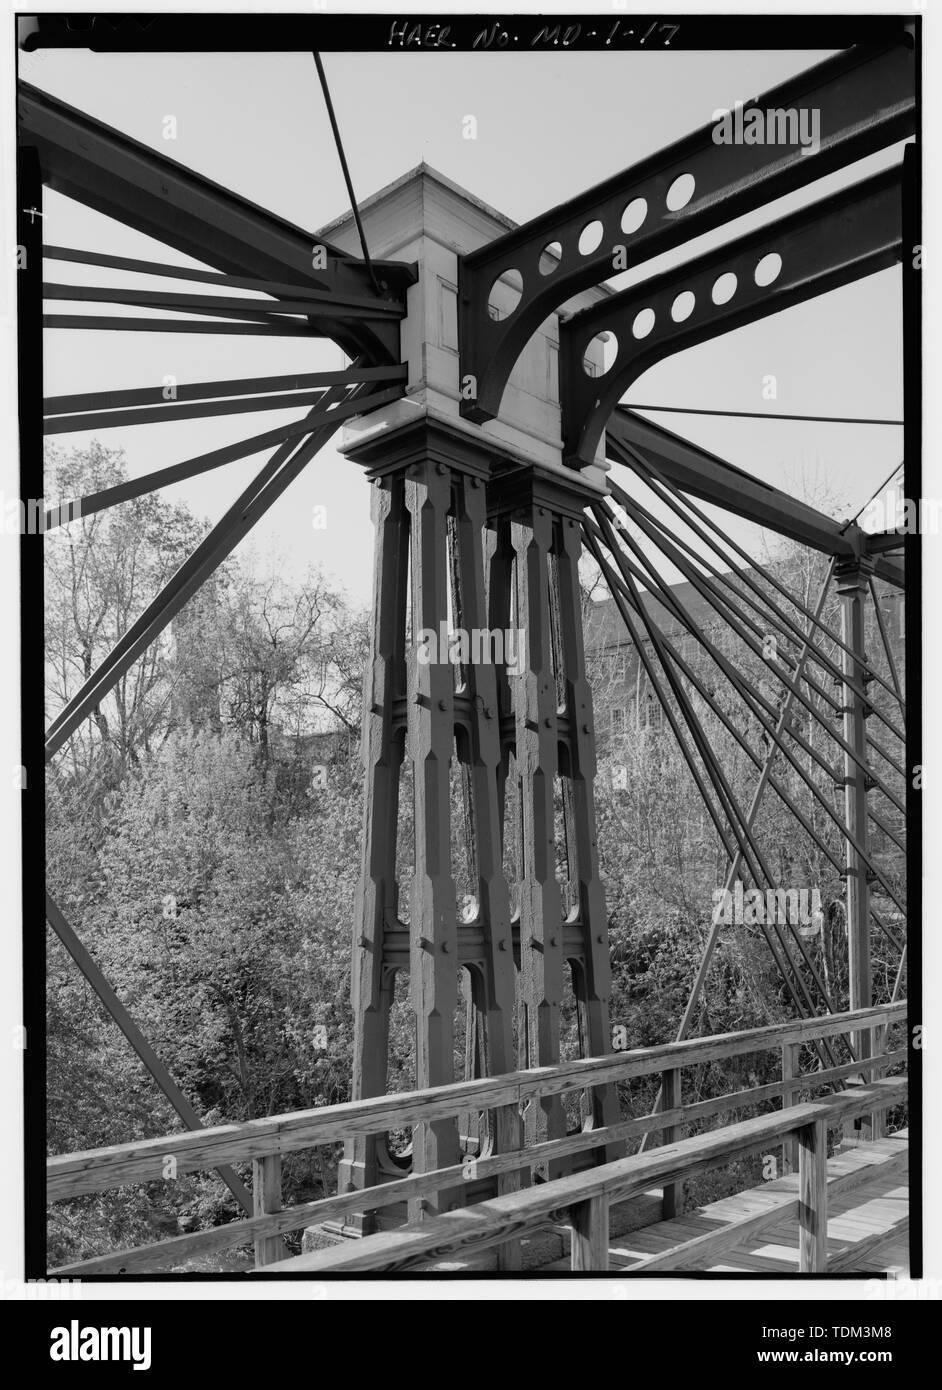 medium resolution of little river truss bridge stock photos little river truss bridge burr arch truss diagram penn central bridge savage bridge maryland